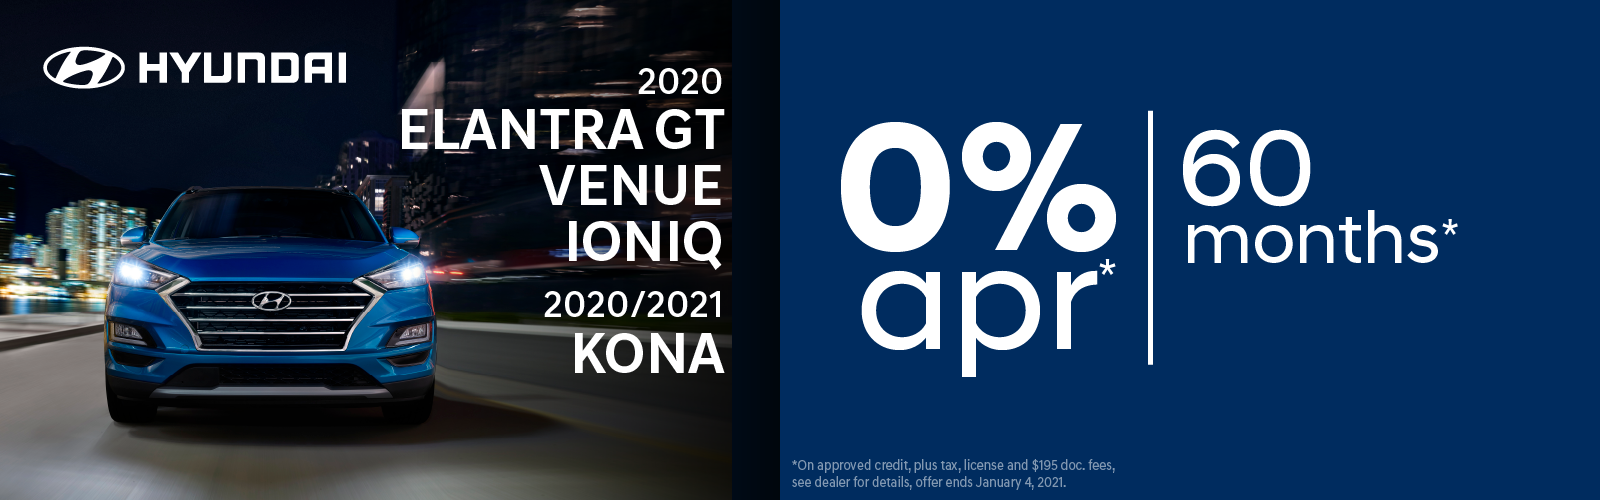 0% apr 60 months on select Hyundai